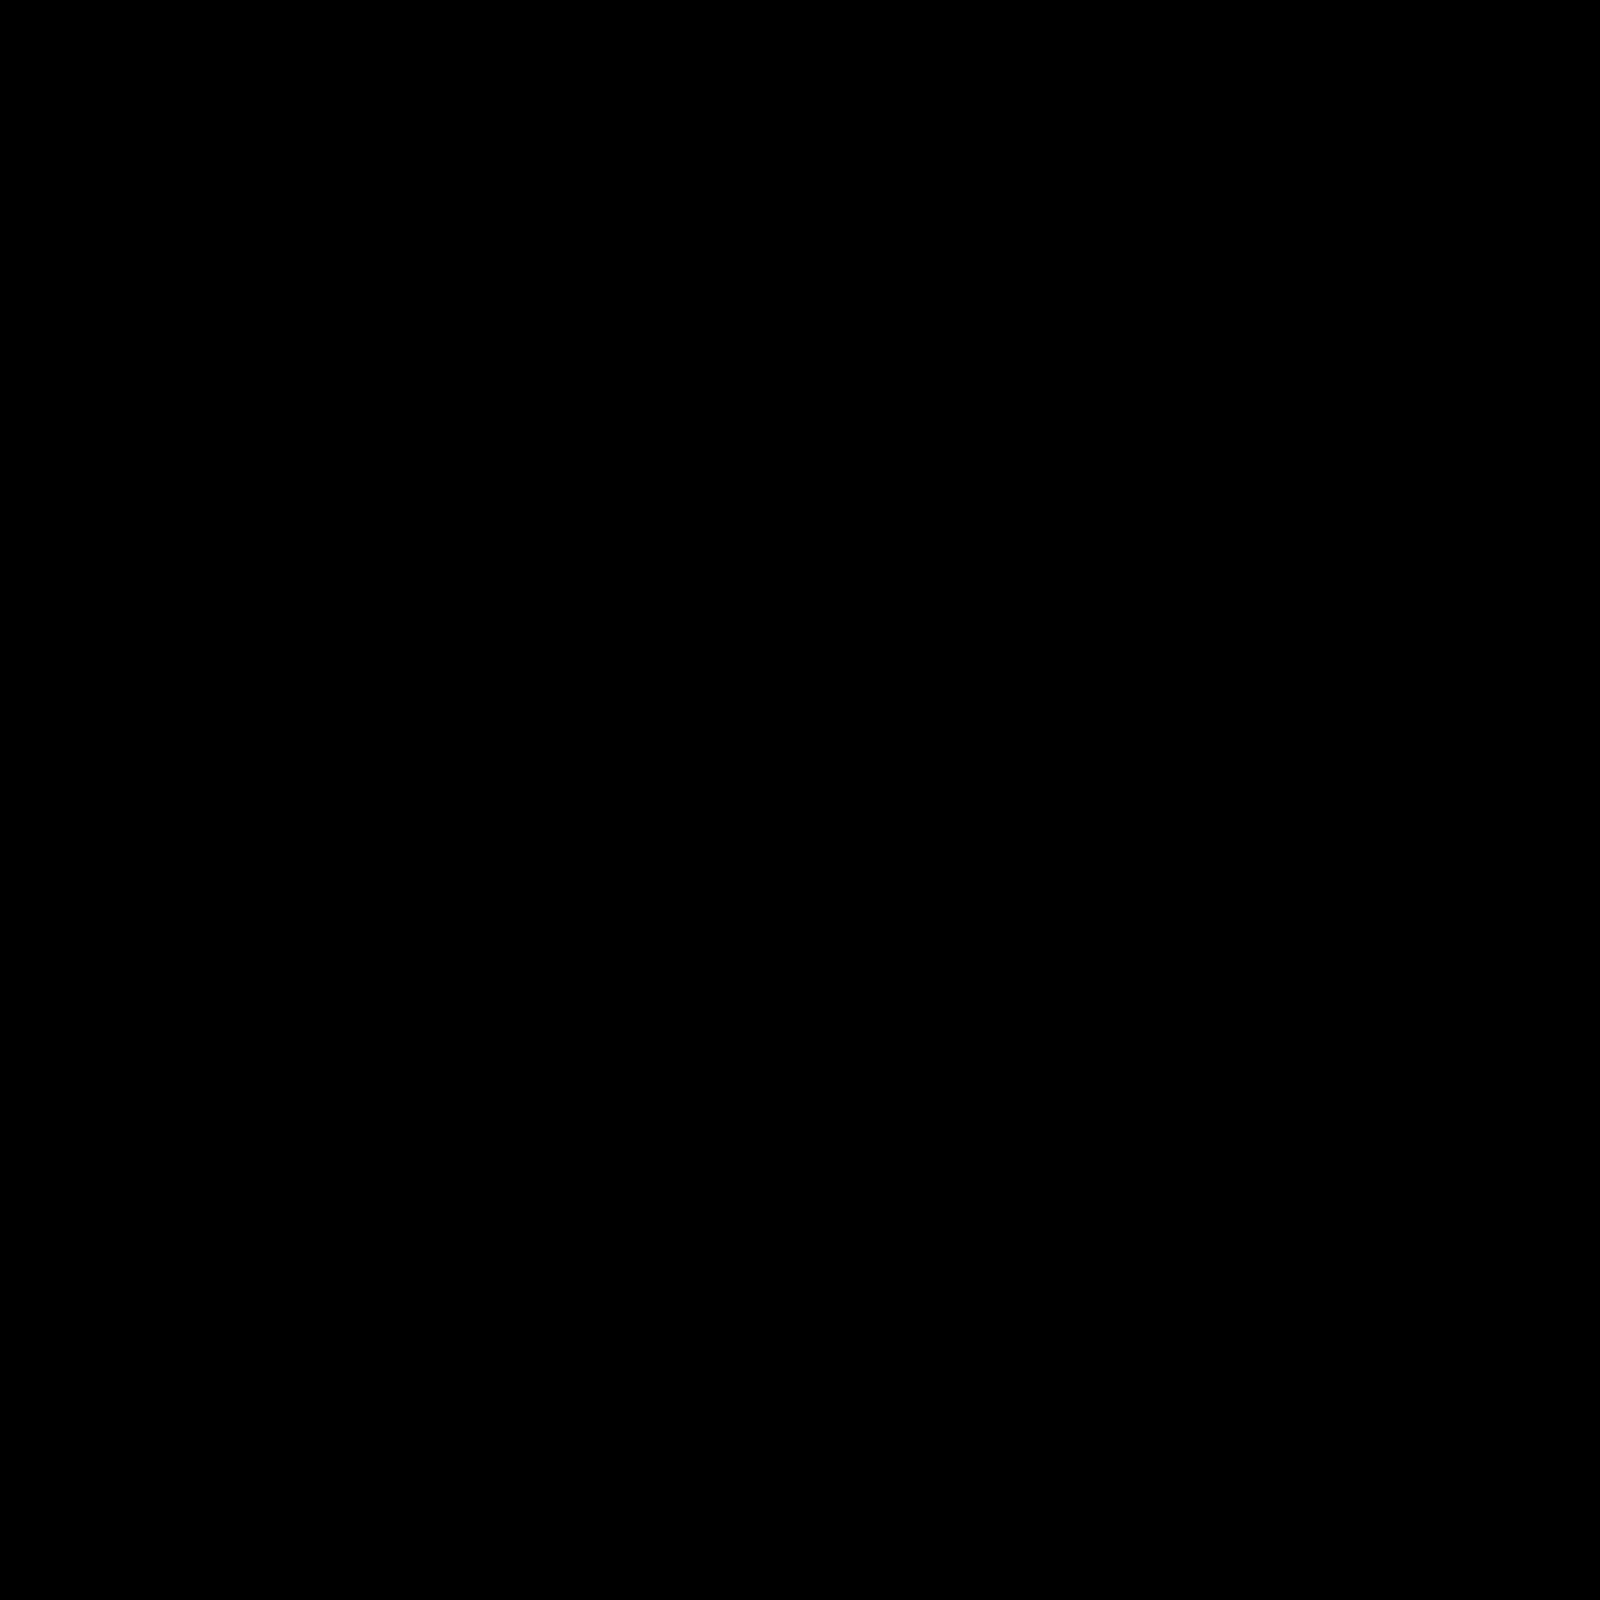 Clipart clock rectangle. Computer icons clip art